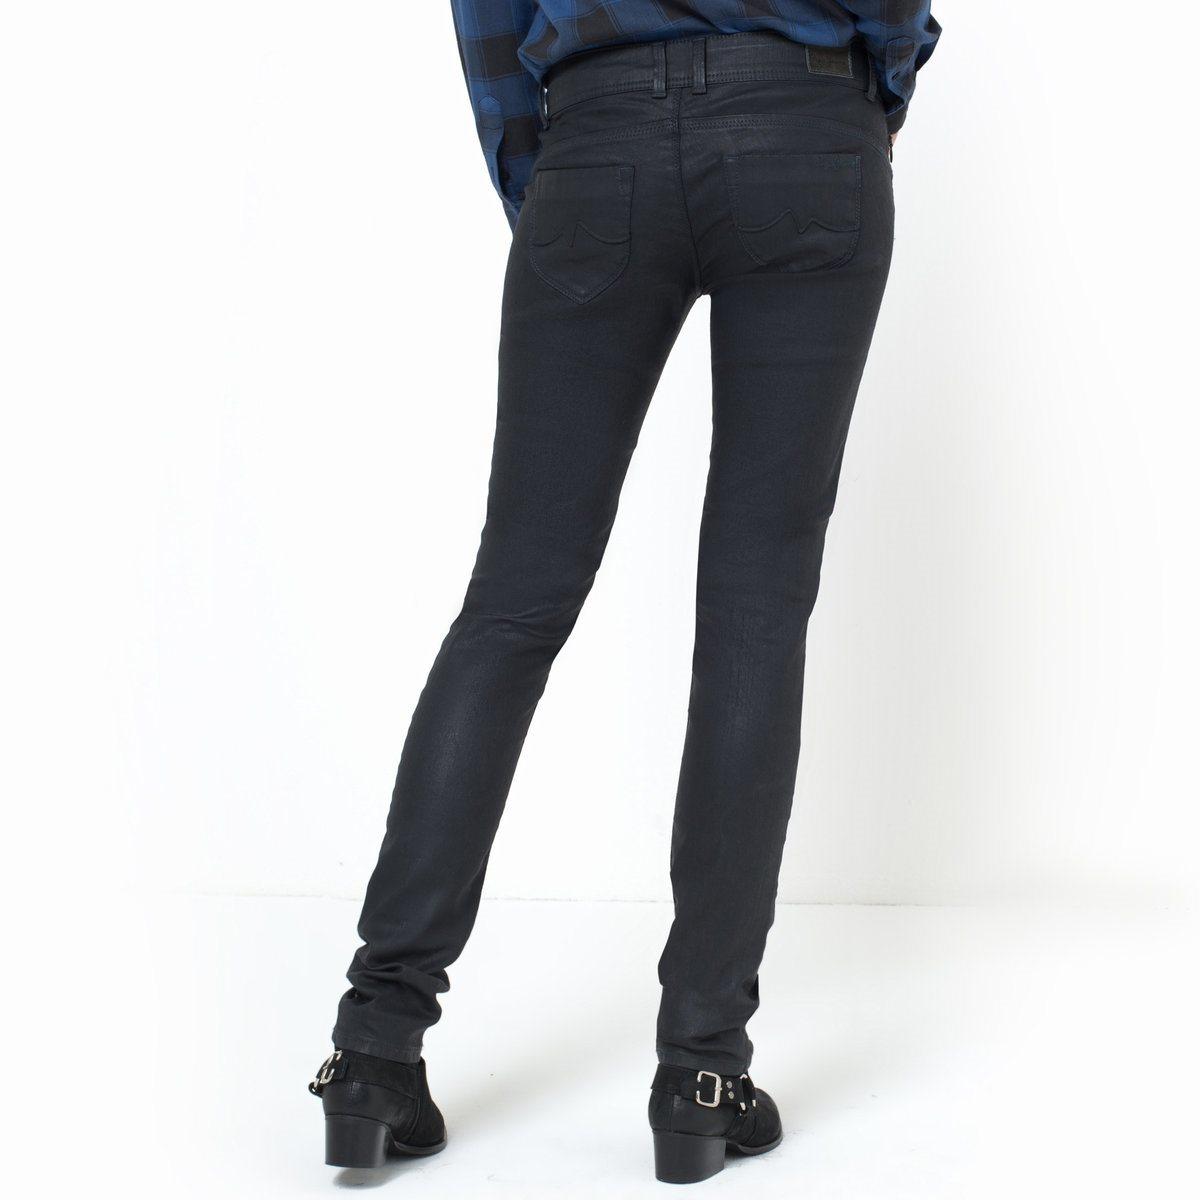 pepe jeans new brooke coated slim fit jeans in black lyst. Black Bedroom Furniture Sets. Home Design Ideas